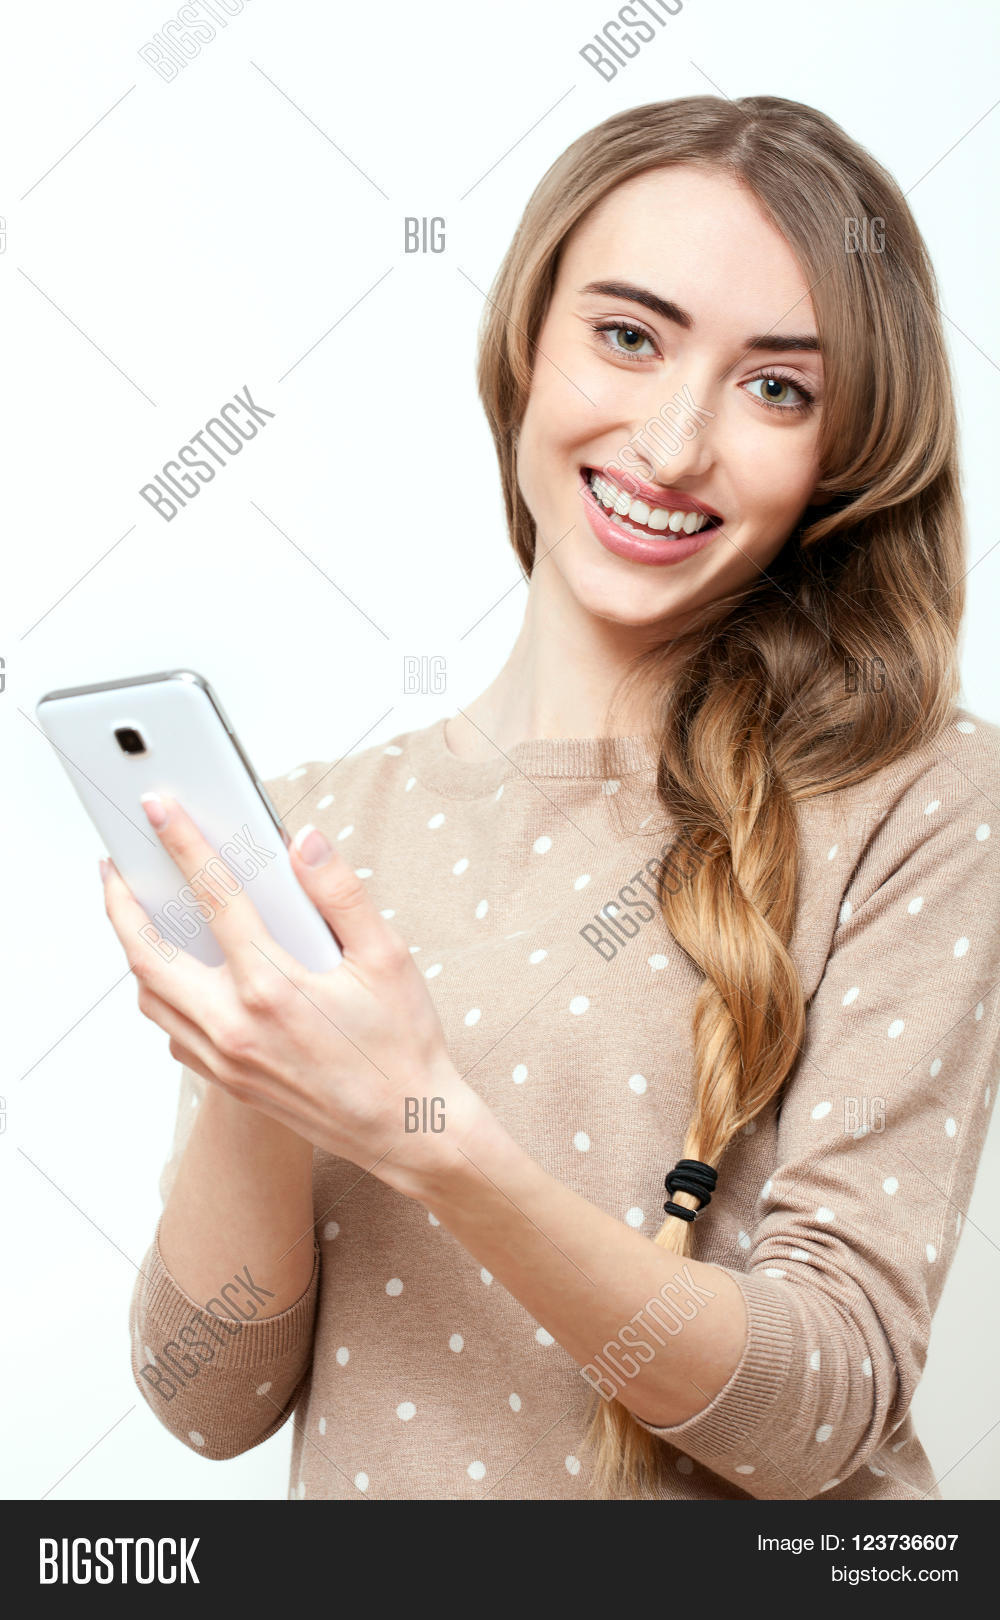 Free mobile perfect girl